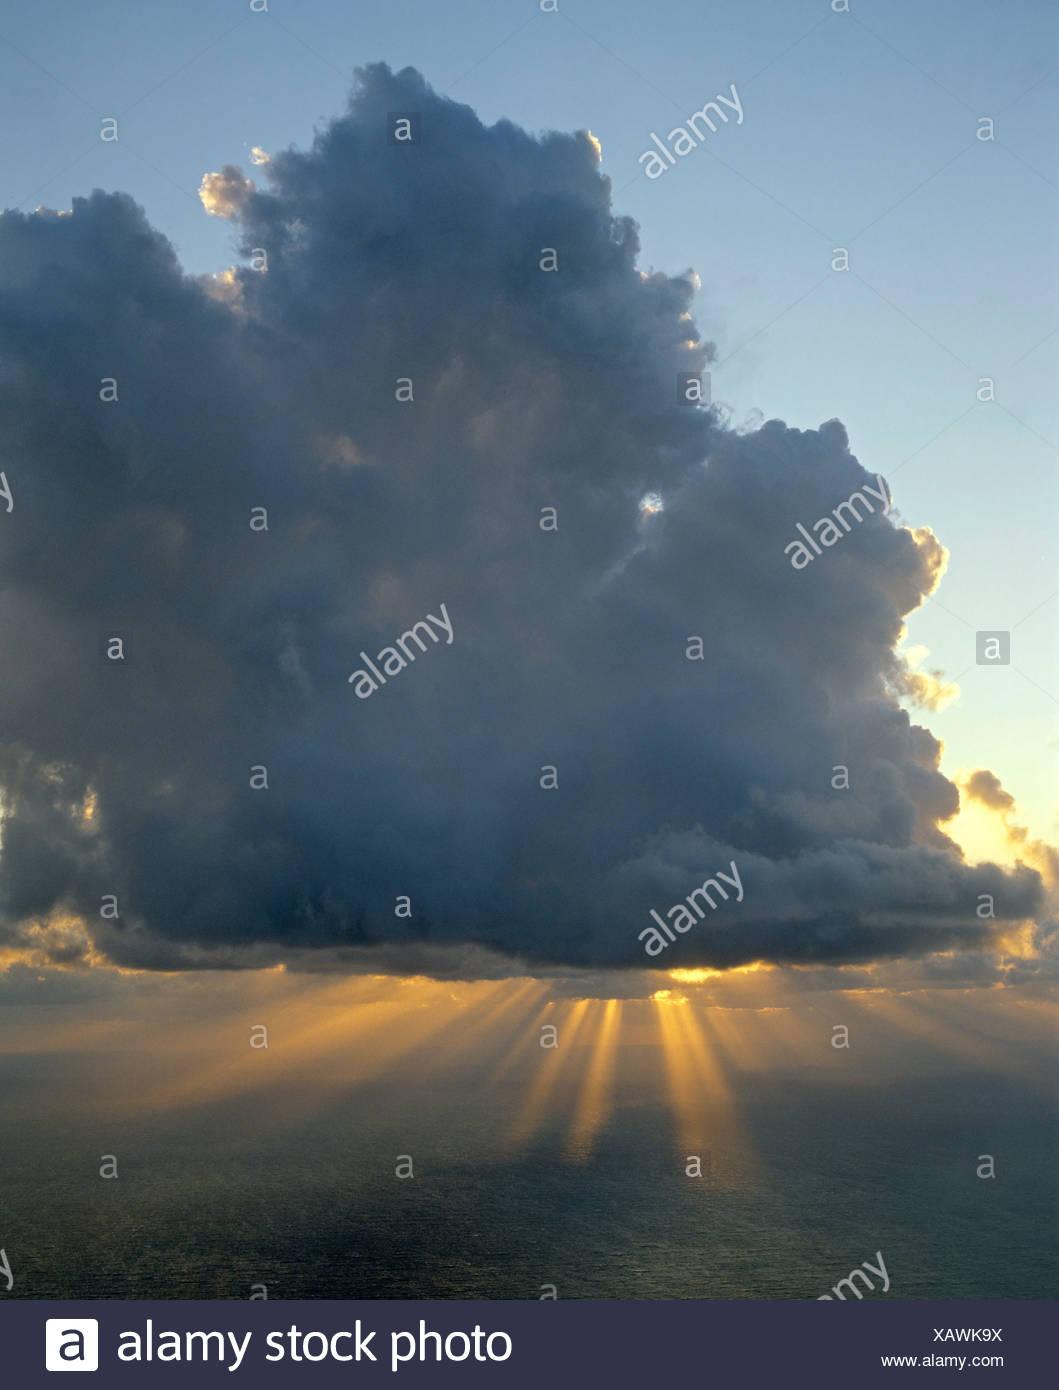 Peak of Stromboli Volcano, sunbeams, rays of sunlight, Aeolian Islands, Sicily, Italy Stock Photo